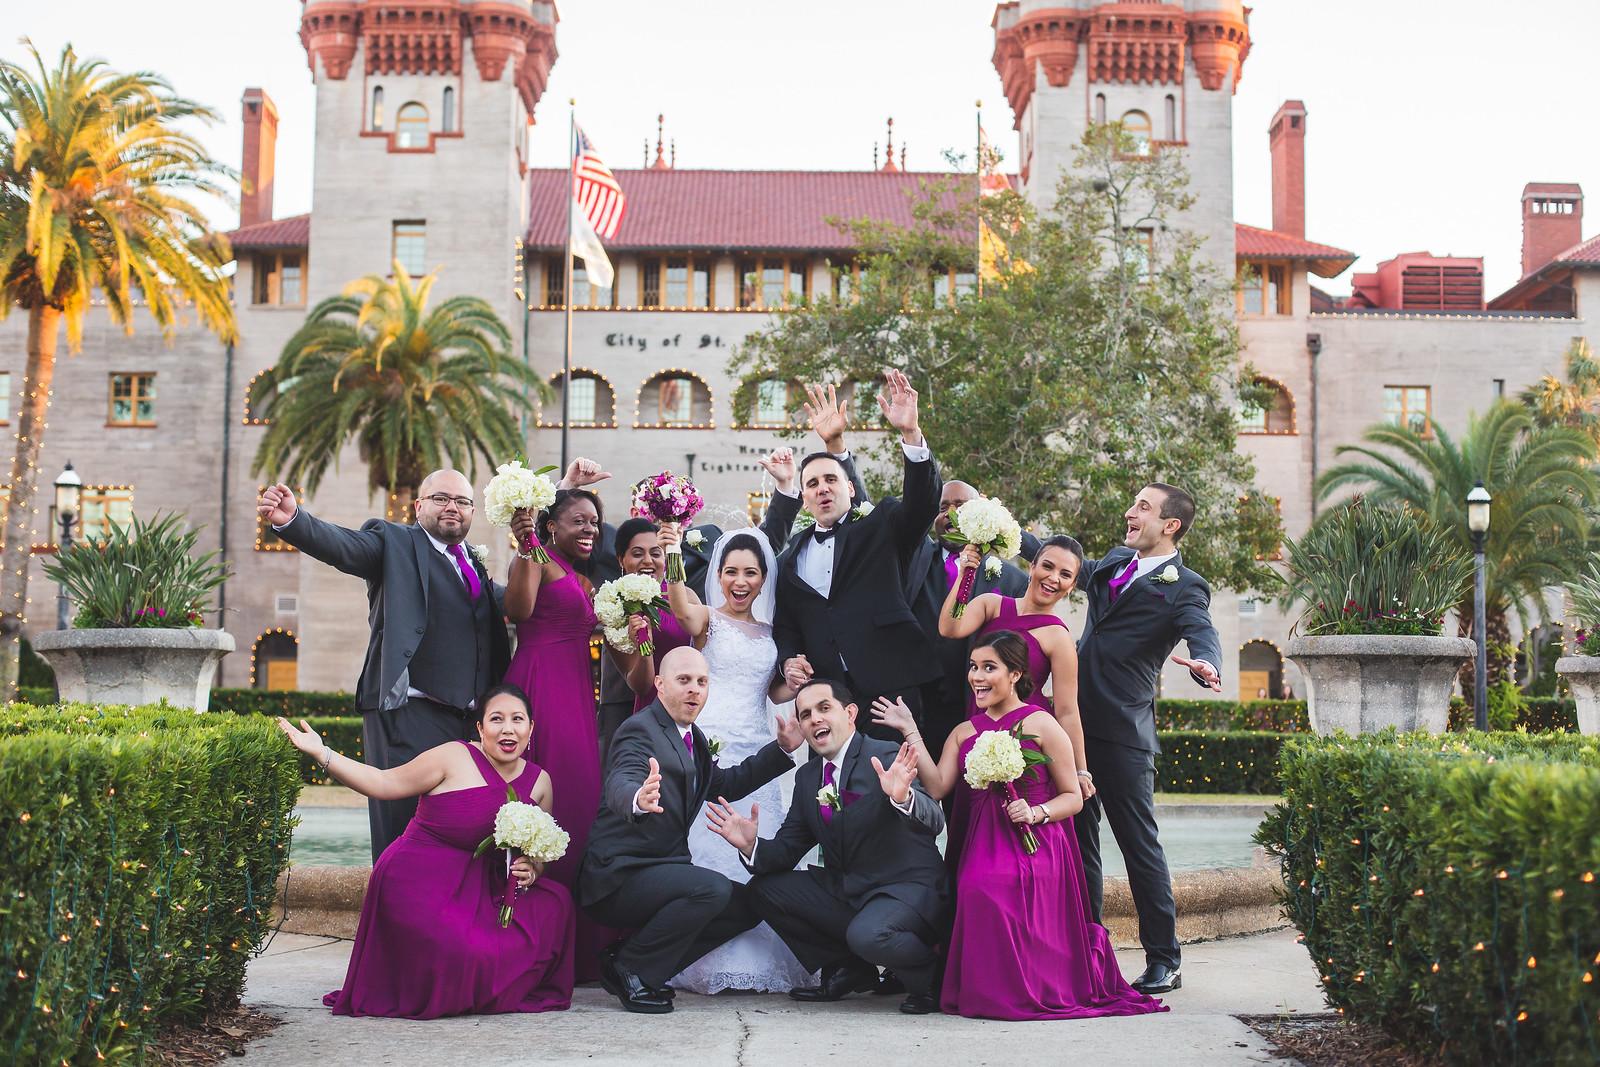 adam-szarmack-st-augustine-wedding-photographer-43.jpg